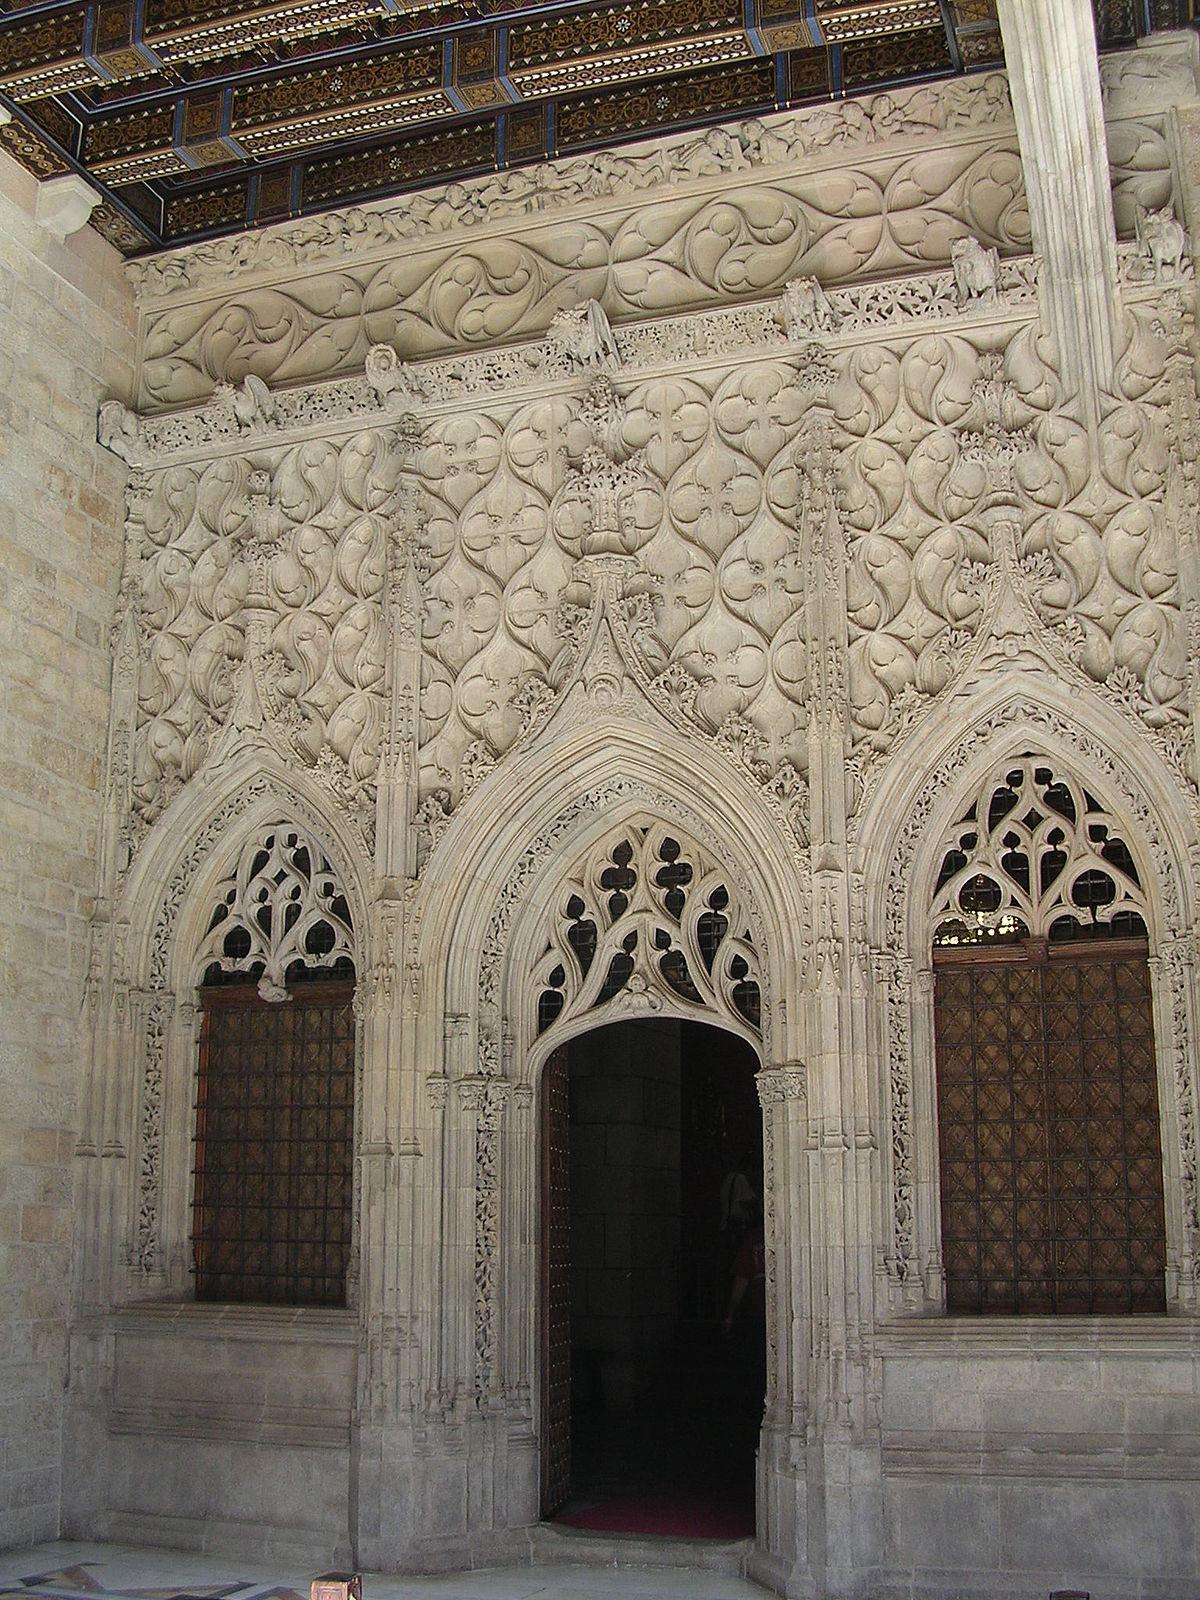 Frontispiece Architecture Wikipedia